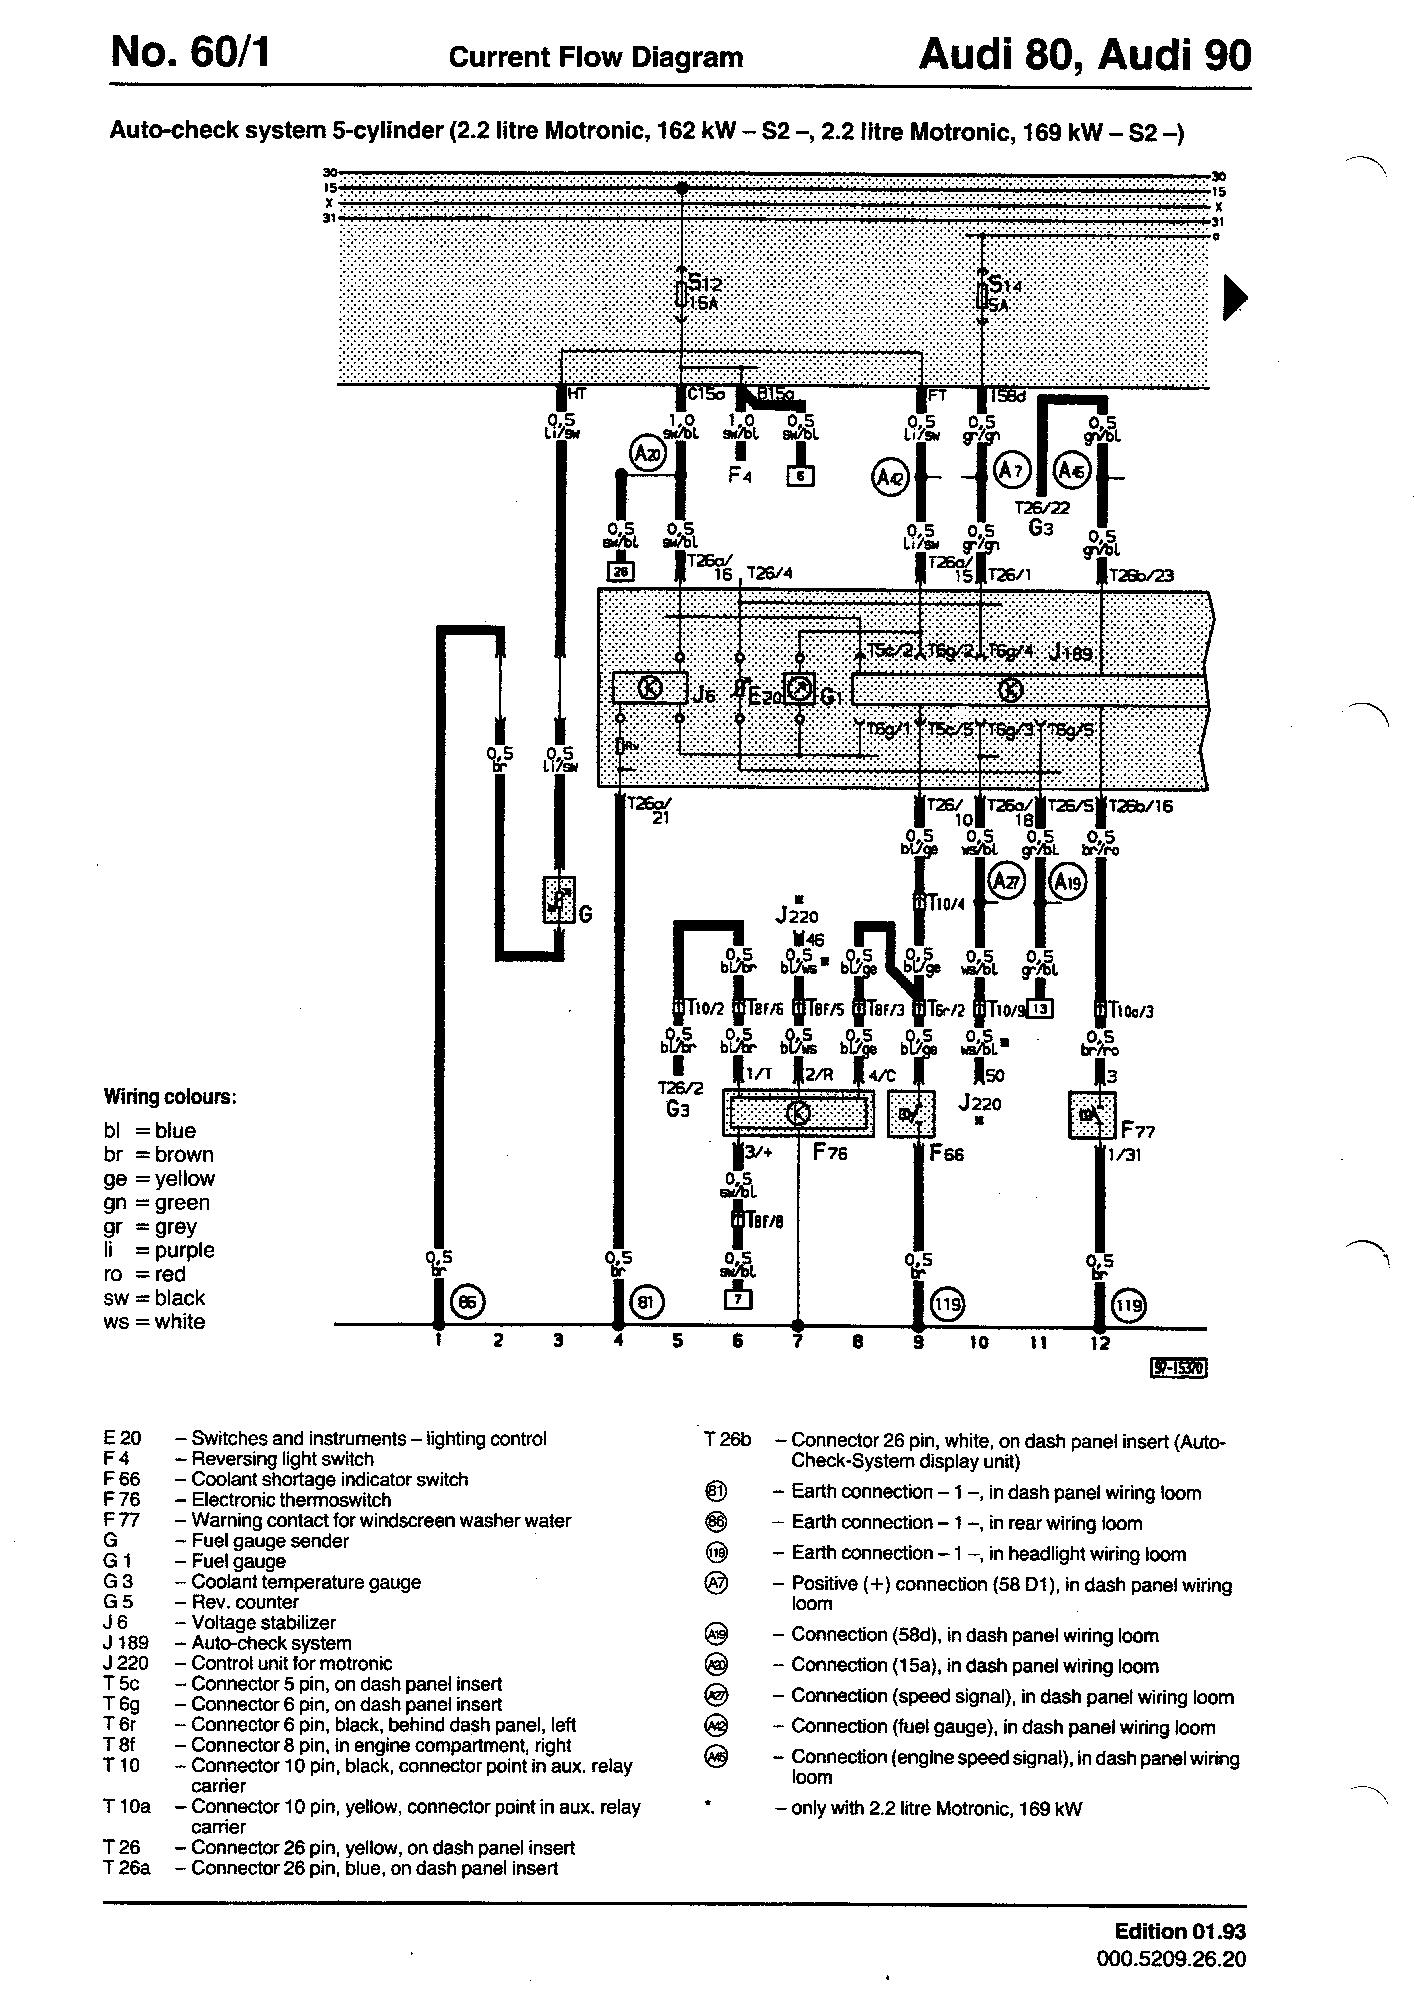 unique audi a4 central locking pump wiring diagram diagram audi a4 central locking pump wiring diagram [ 1414 x 2000 Pixel ]